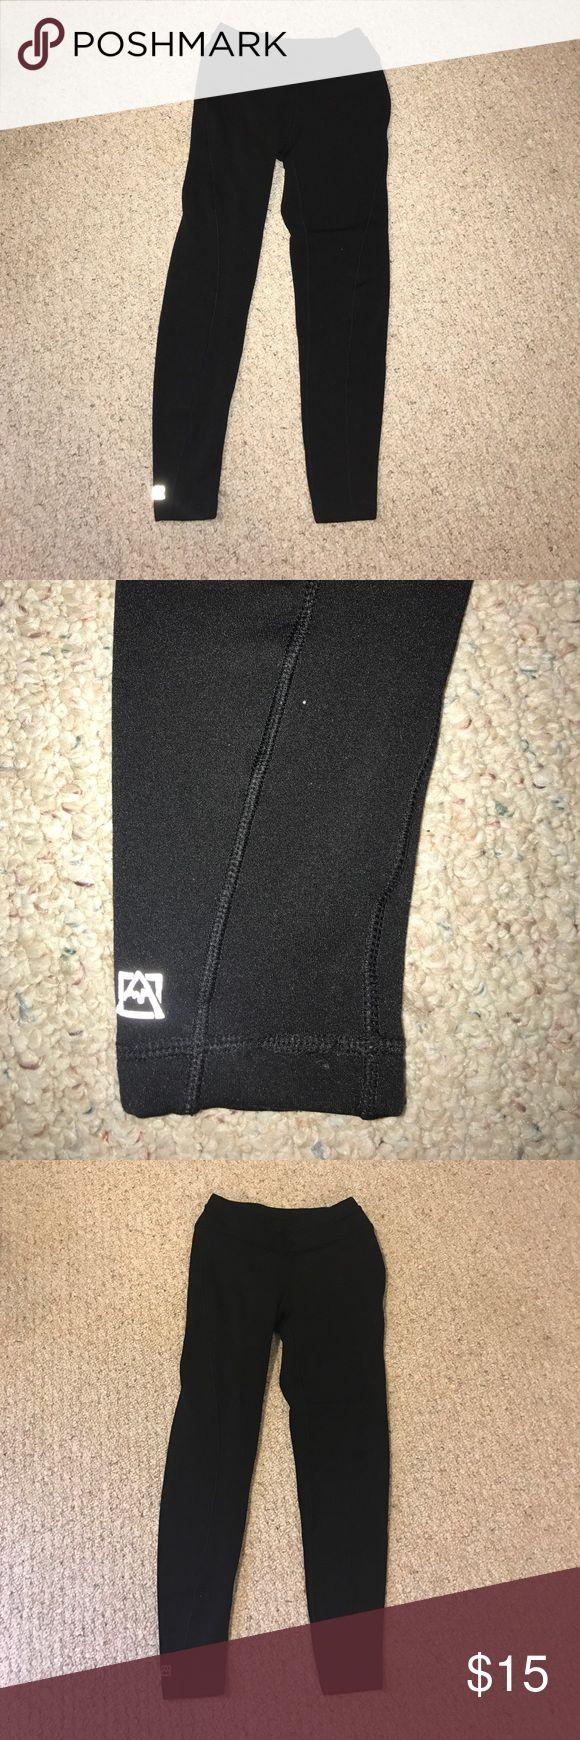 Avalanche medium size thick legging sweatpants Super thick and warm legging style sweatpants from avalanche. Black color. Size medium. Pants